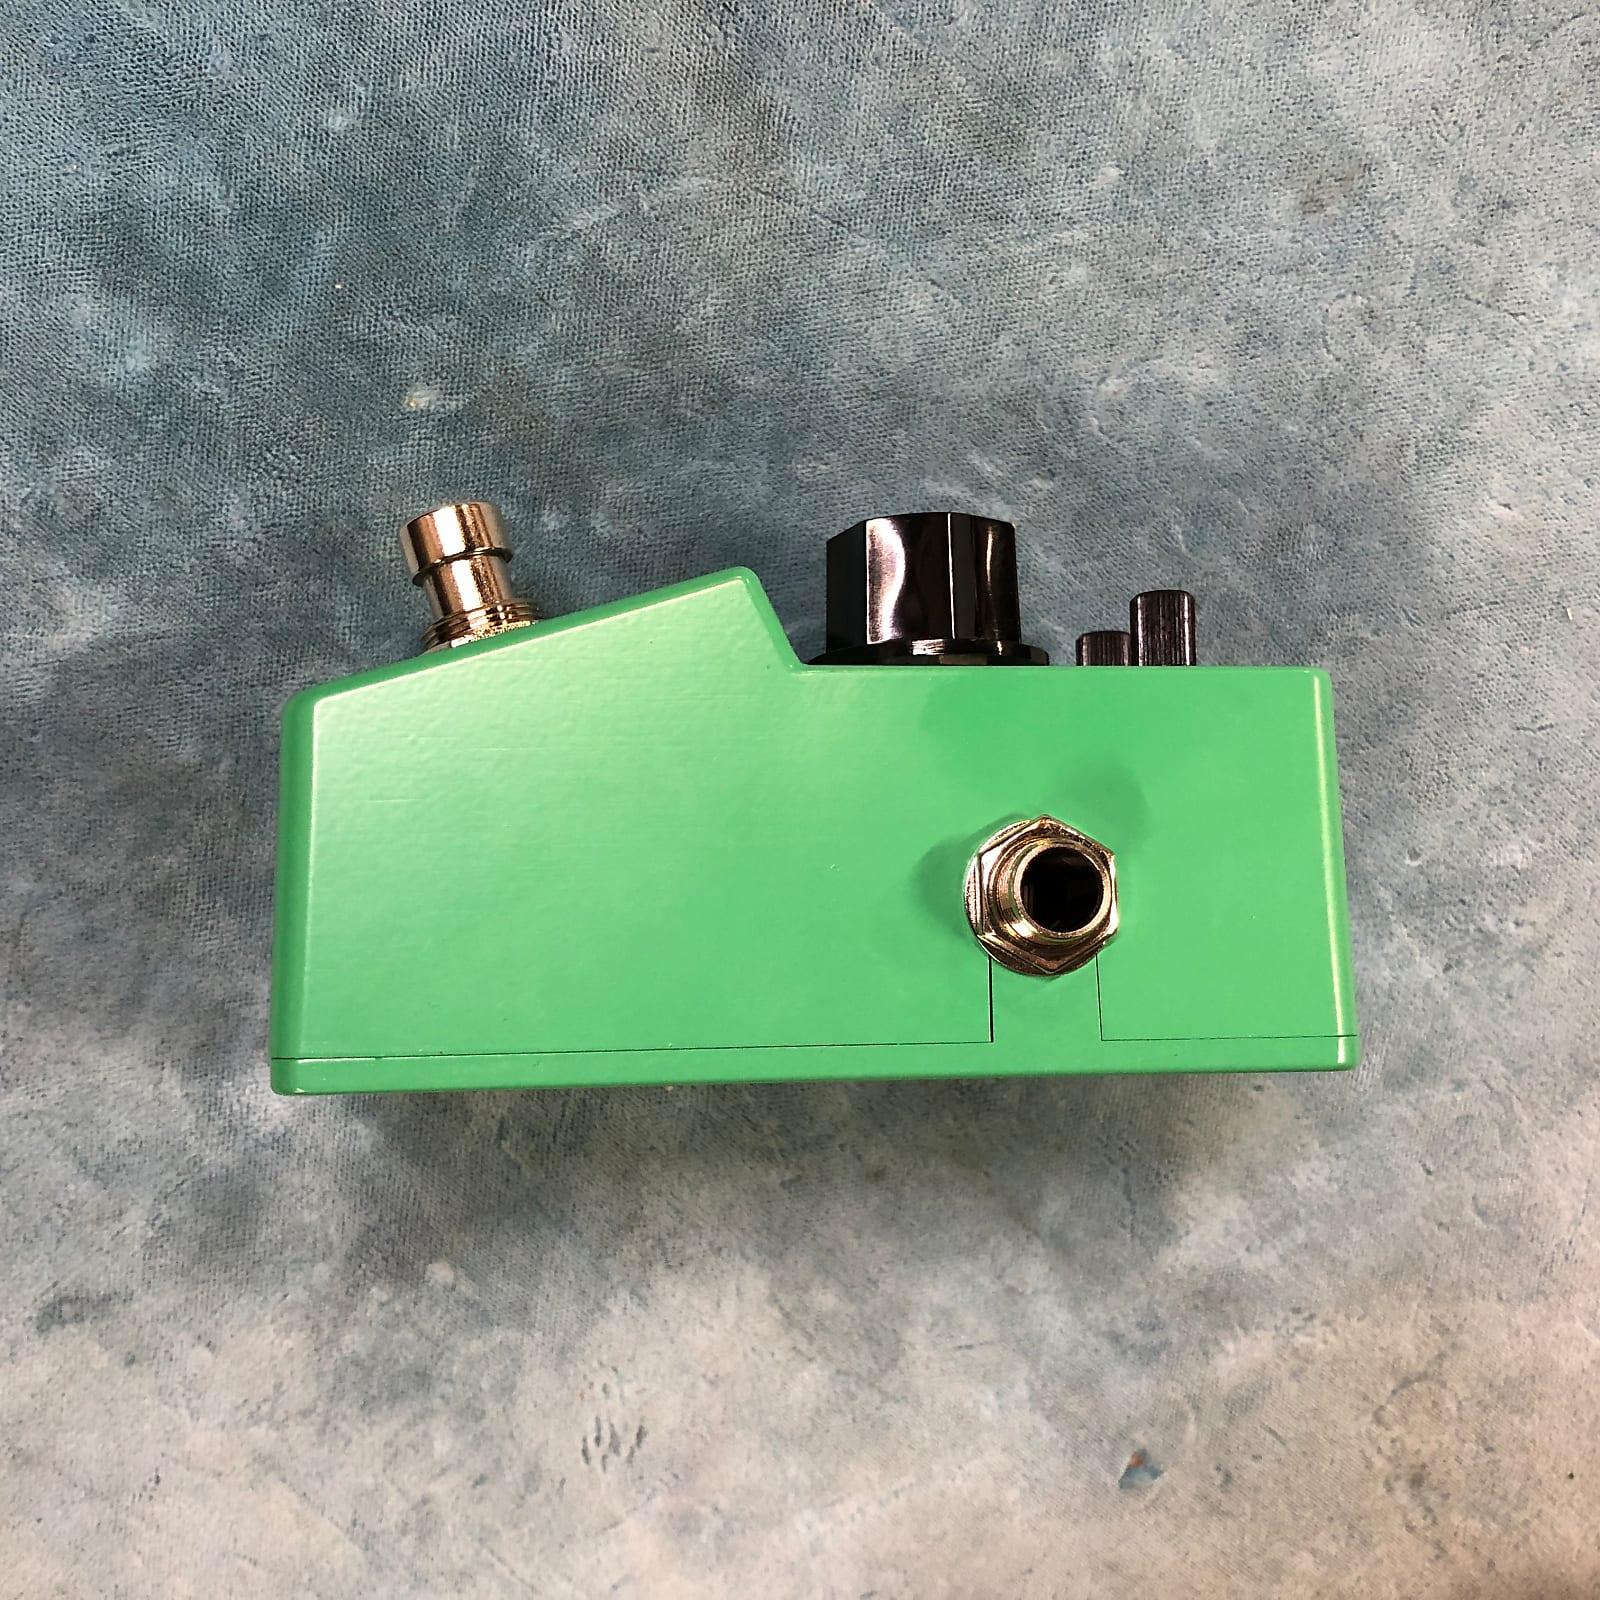 Ibanez TSMINI Tube Screamer Mini Overdrive Effects Pedal